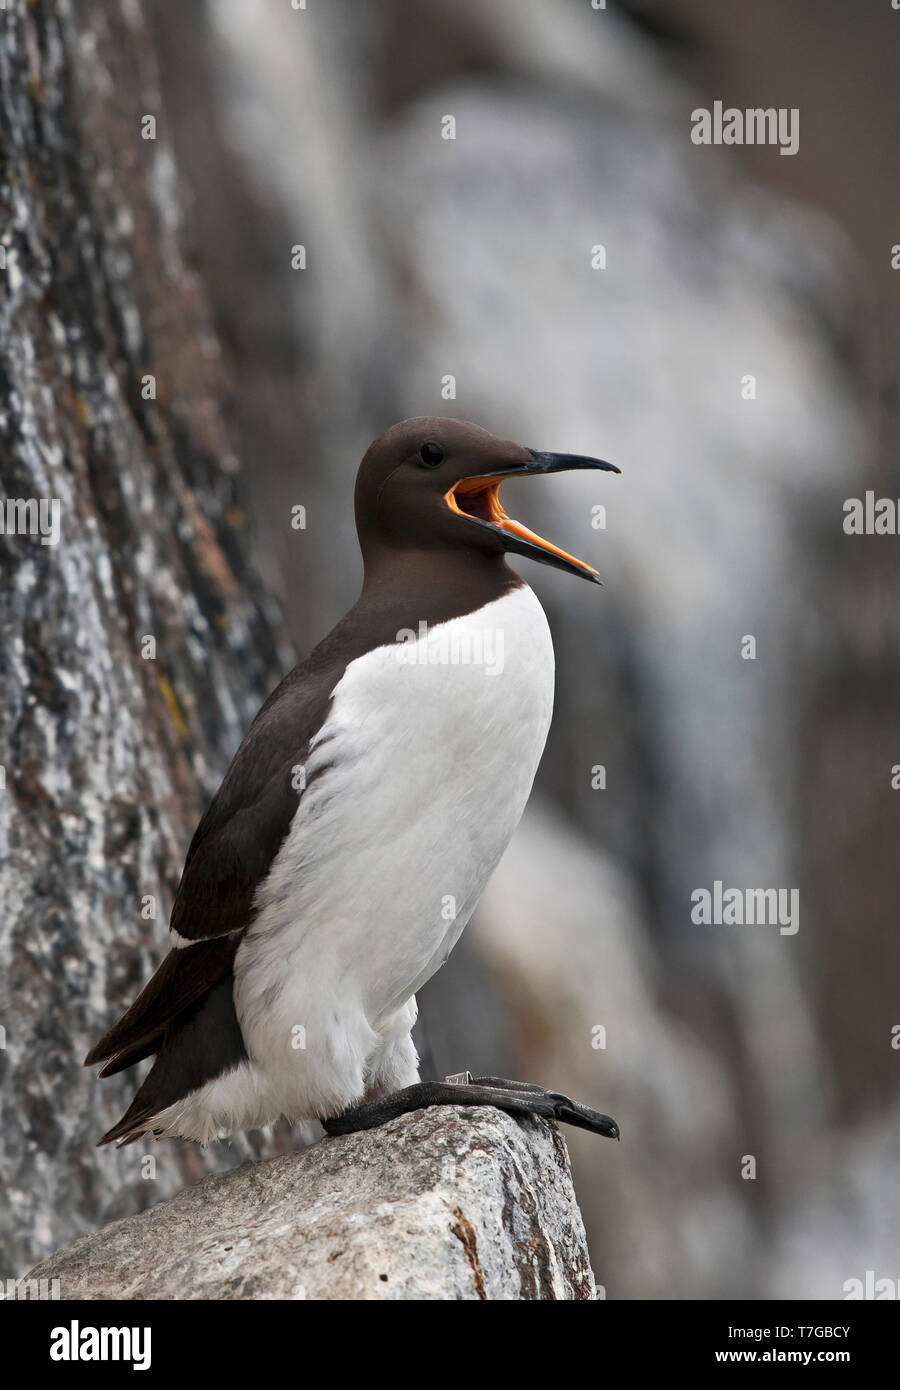 Common Guillemot, Uria aalga - Stock Image